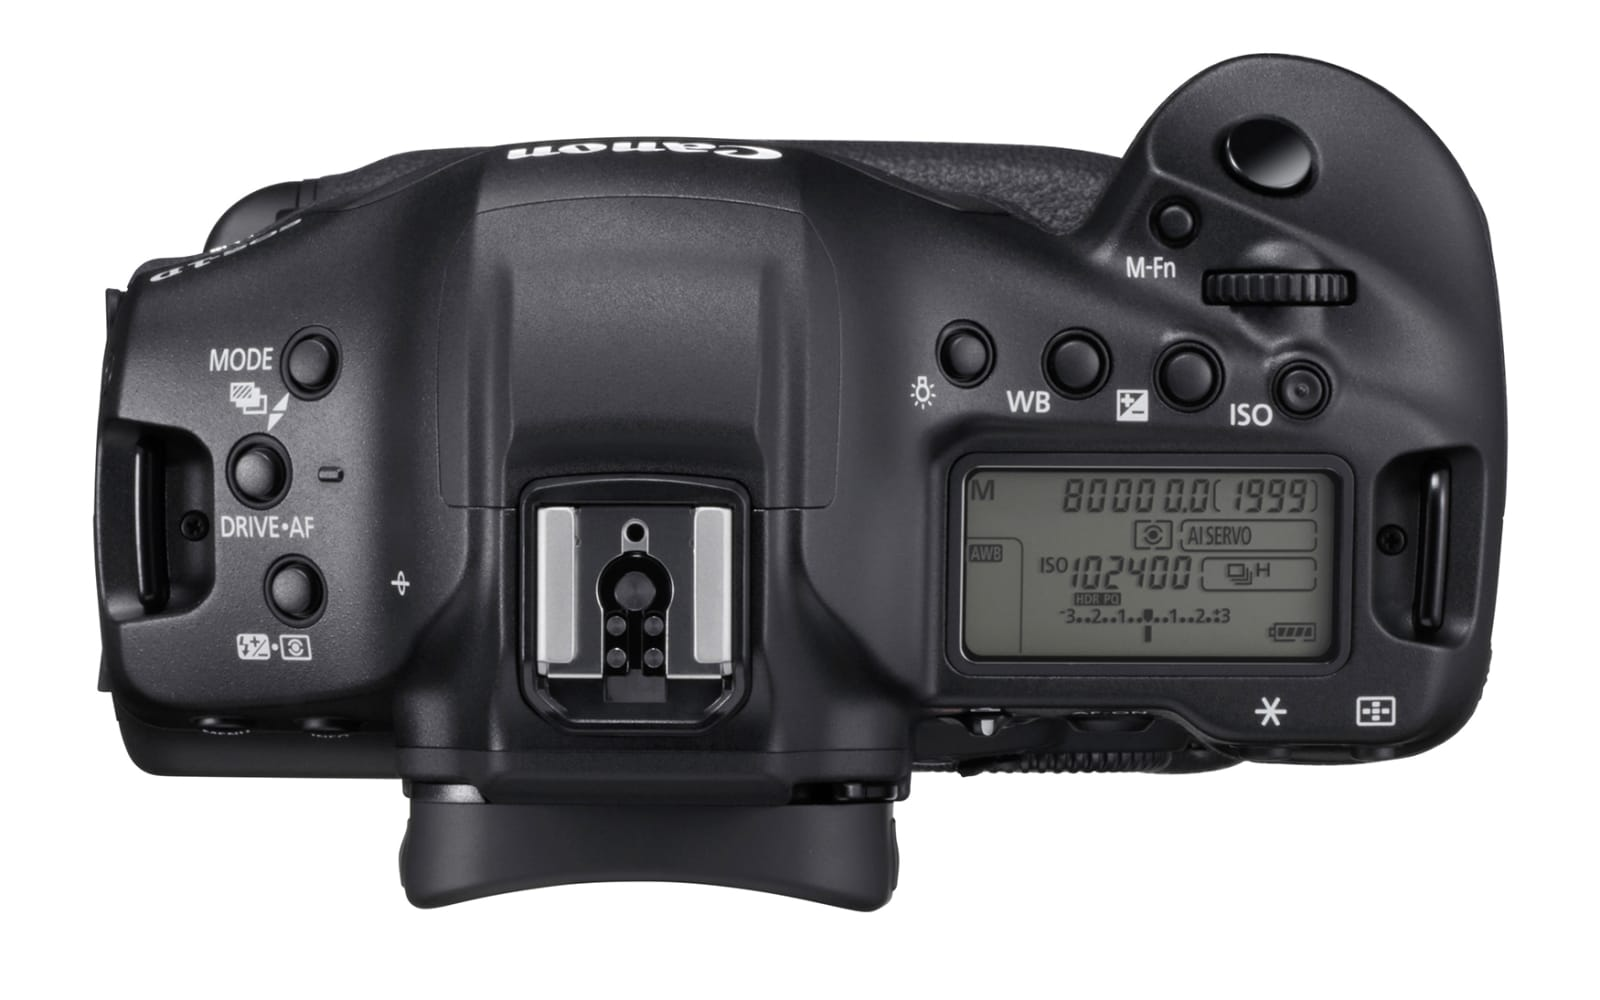 Canon 1DX Mark III DSLR camera 5.5K video 20fps shooting speeds